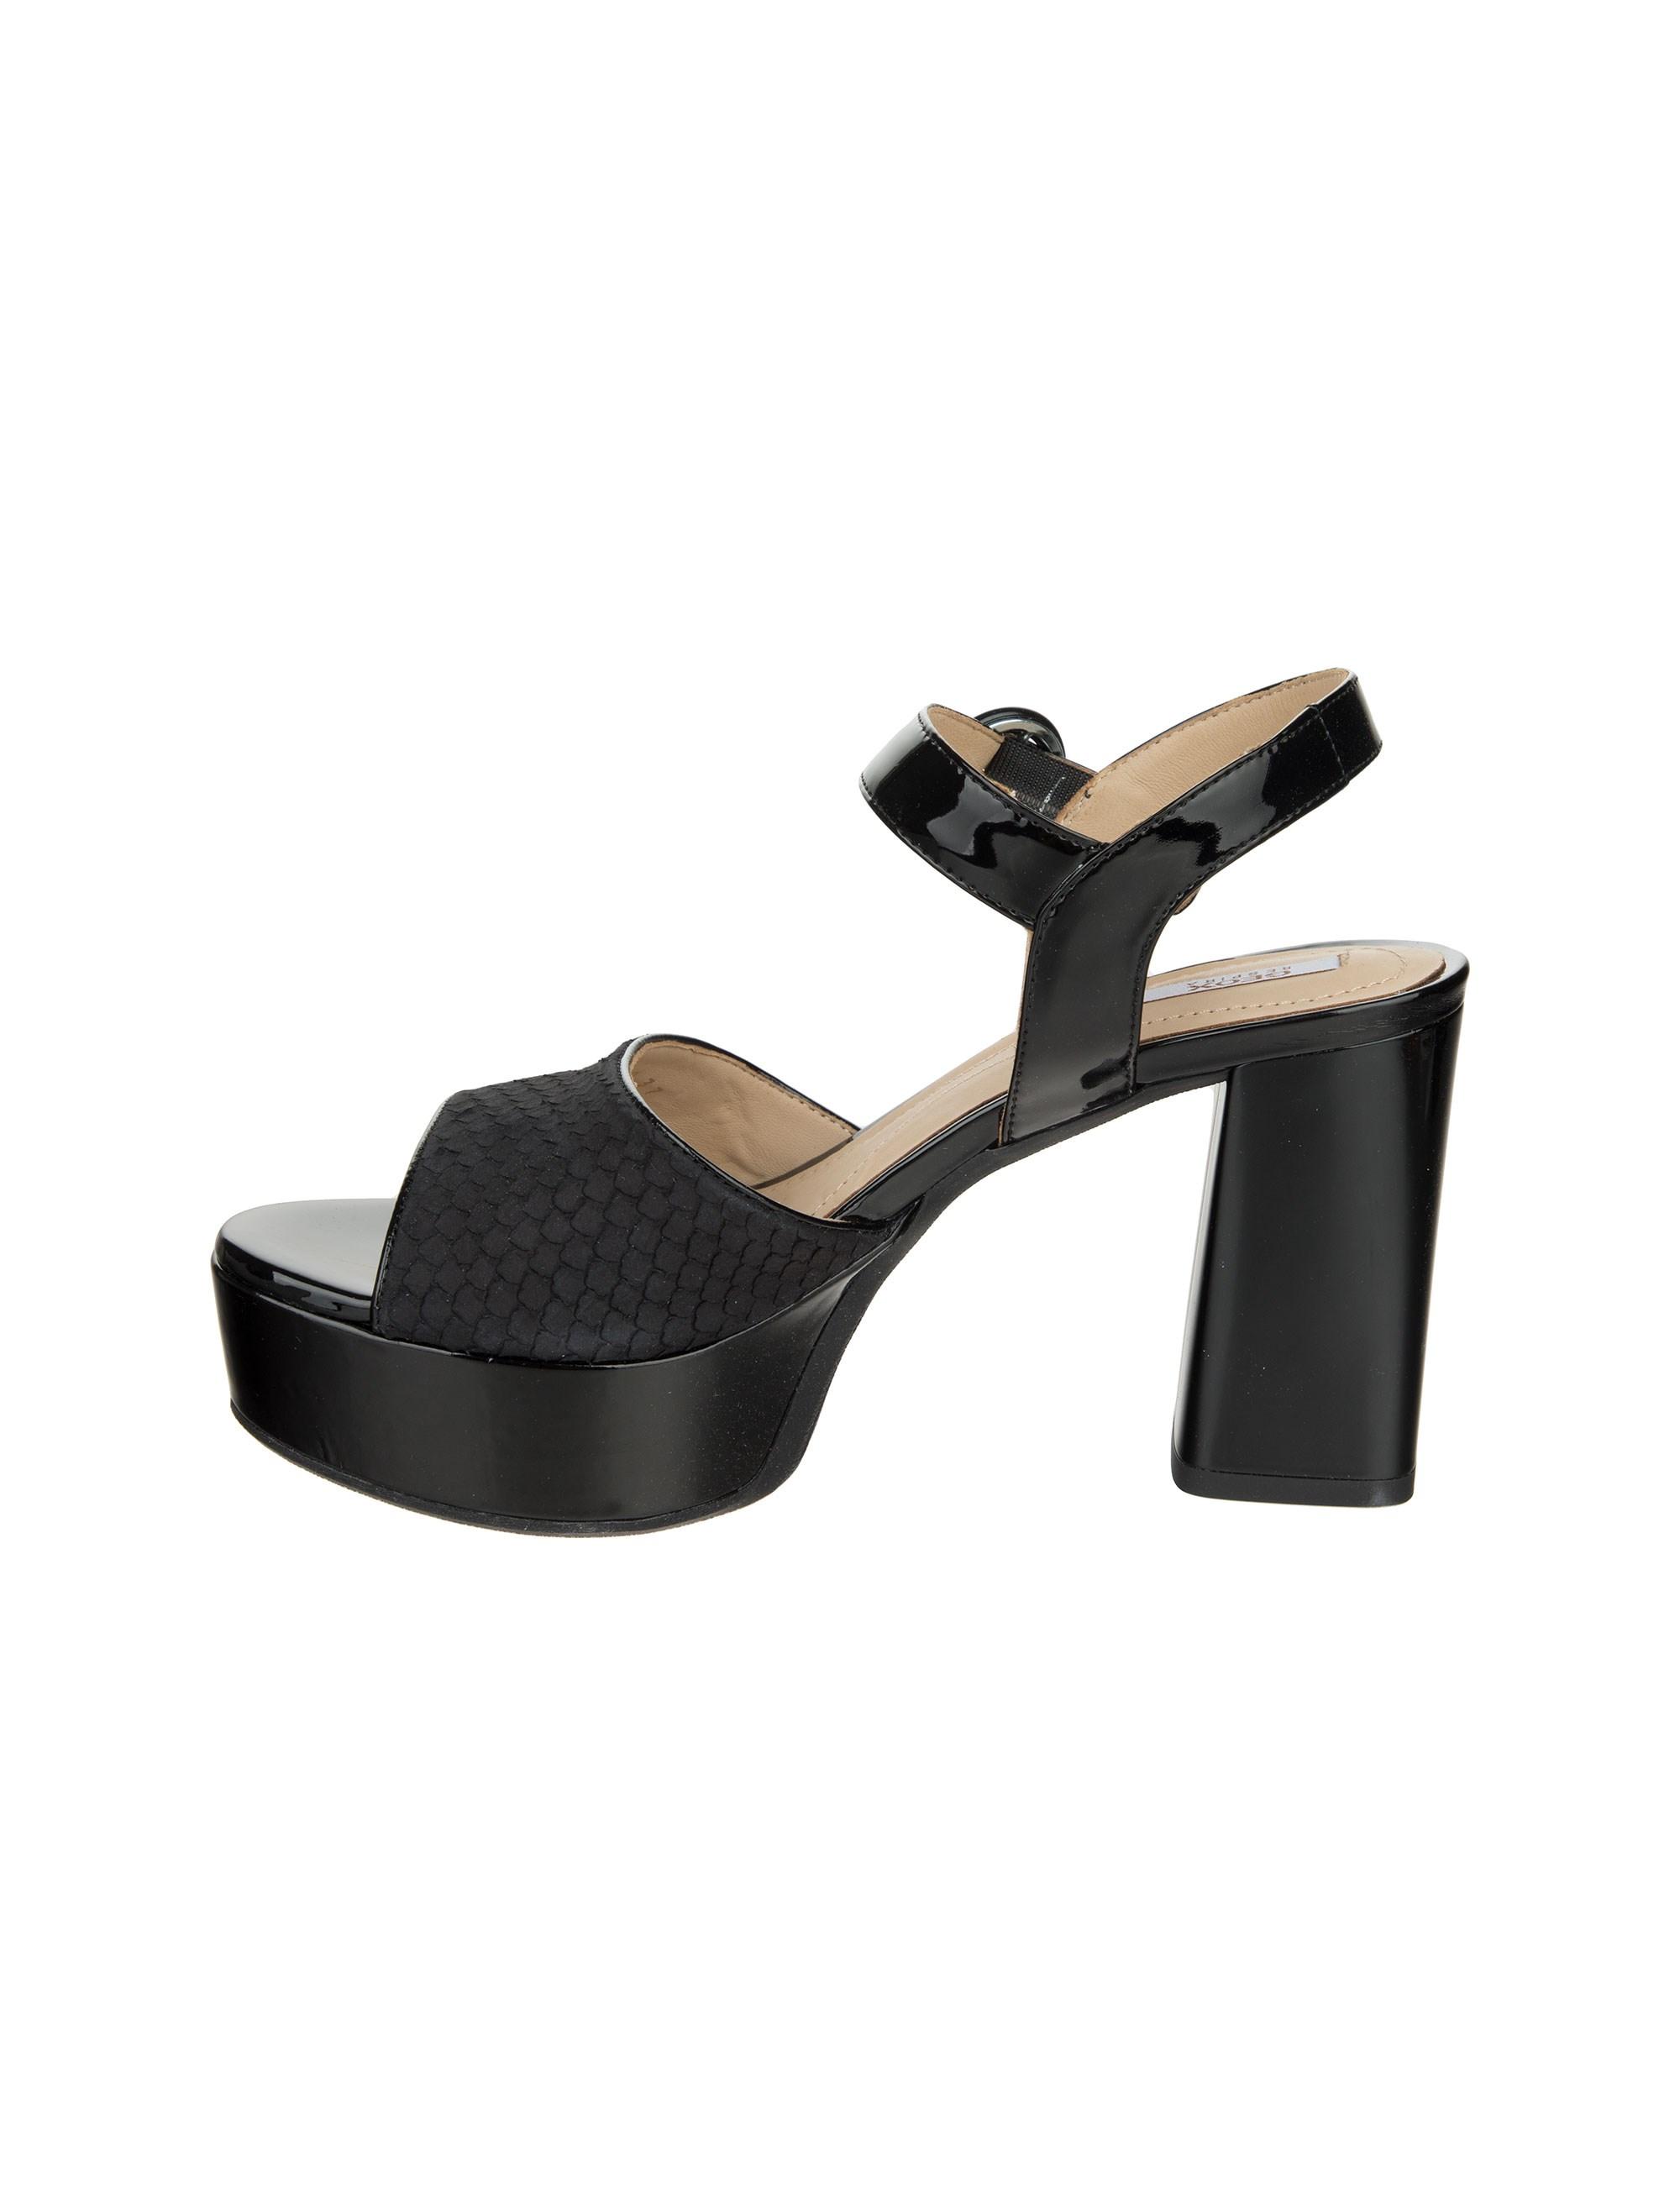 کفش پاشنه بلند چرم زنانه GALENE - جی اوکس